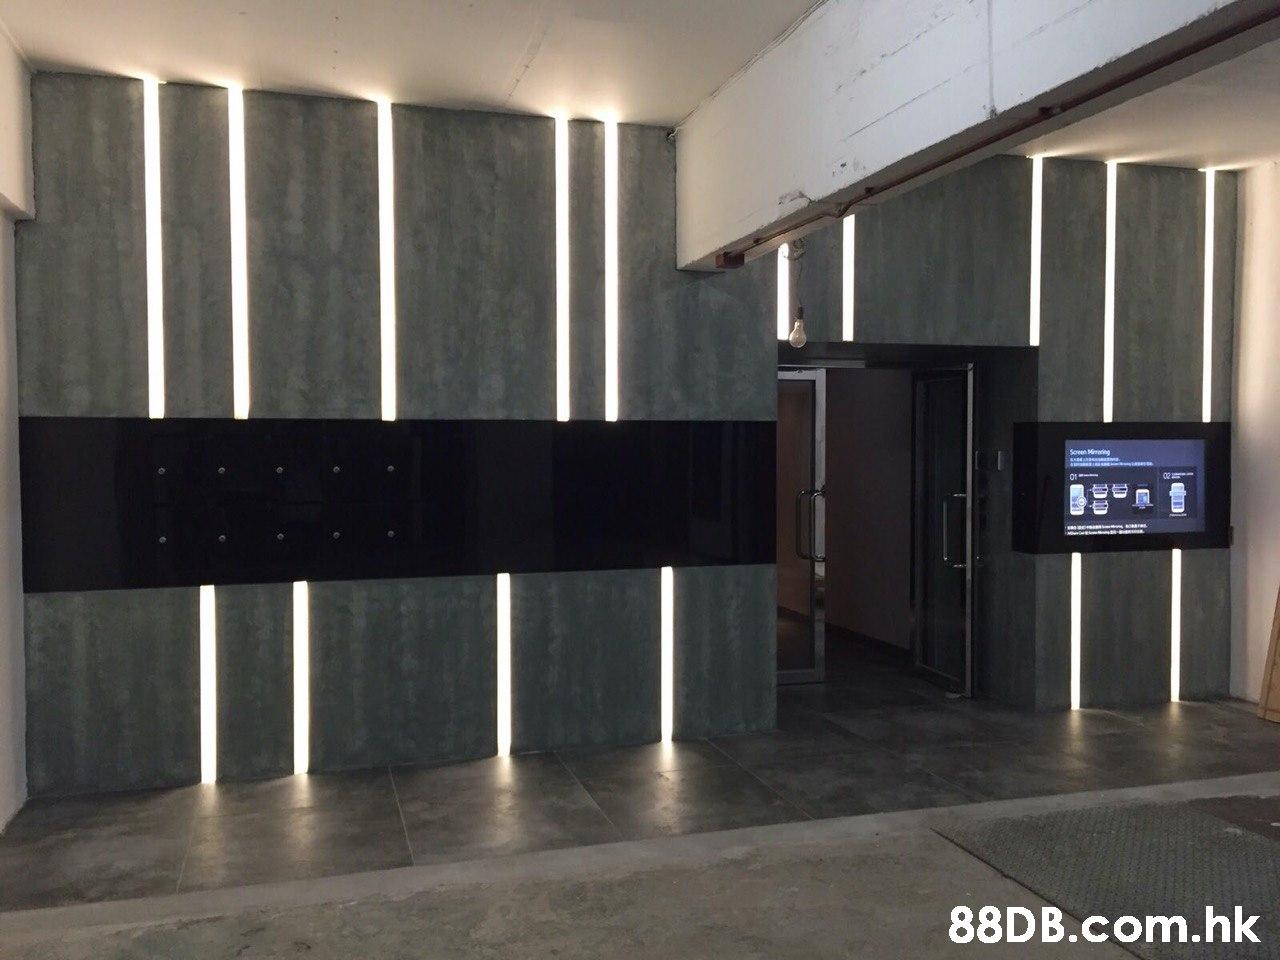 Soeen Miaring .hk DD  Property,Room,Building,Wall,Floor